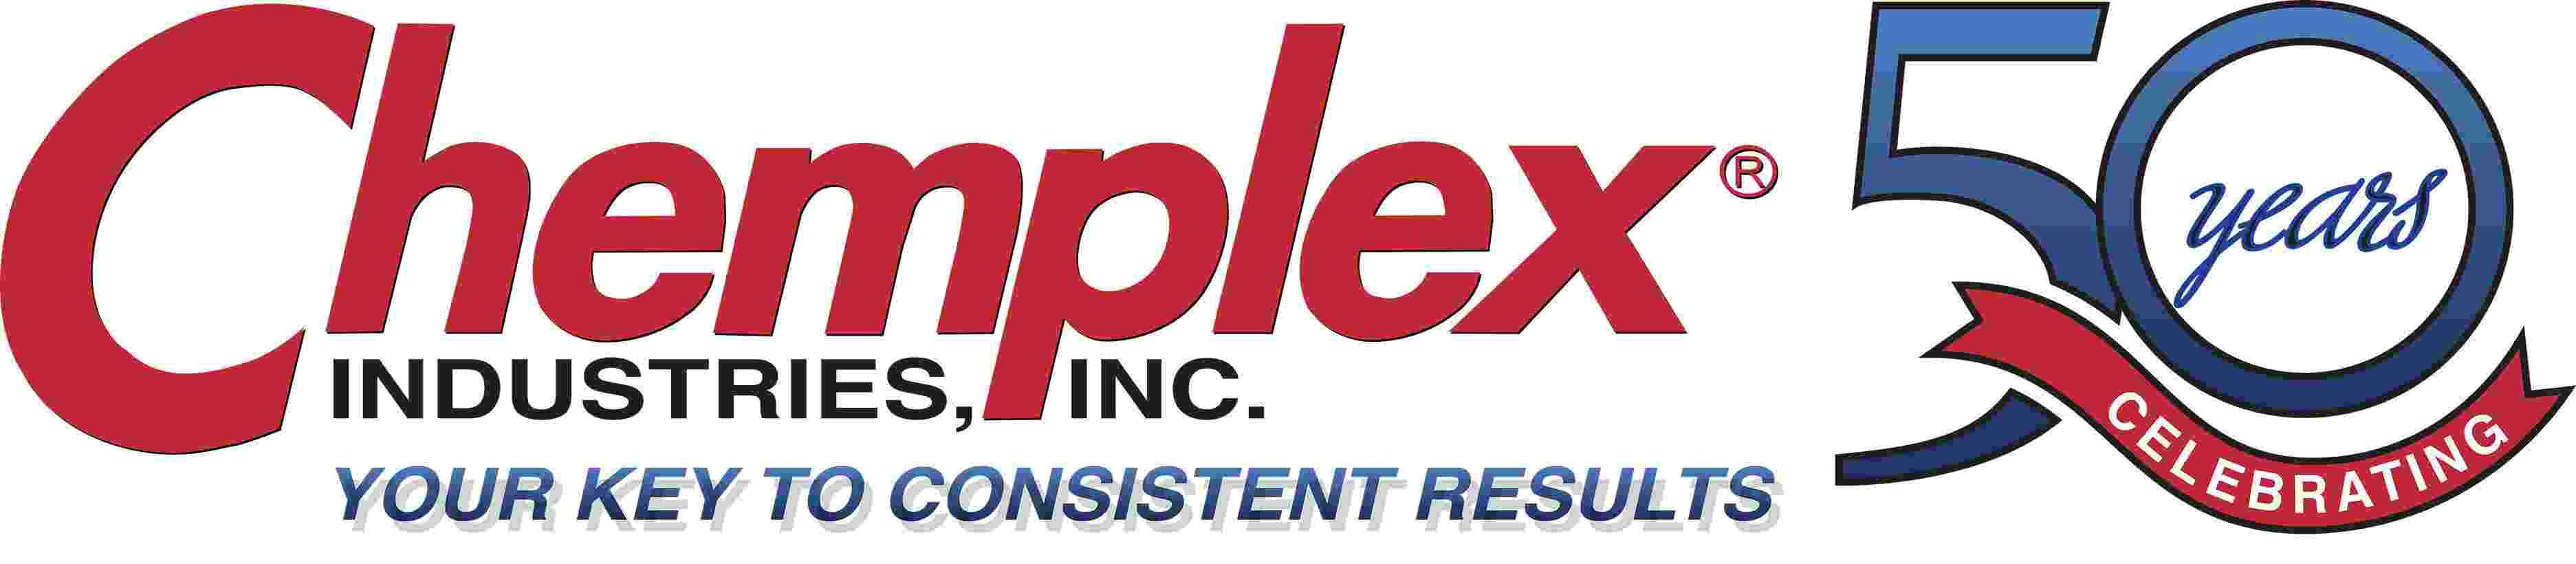 Chemplex Industries, Inc.